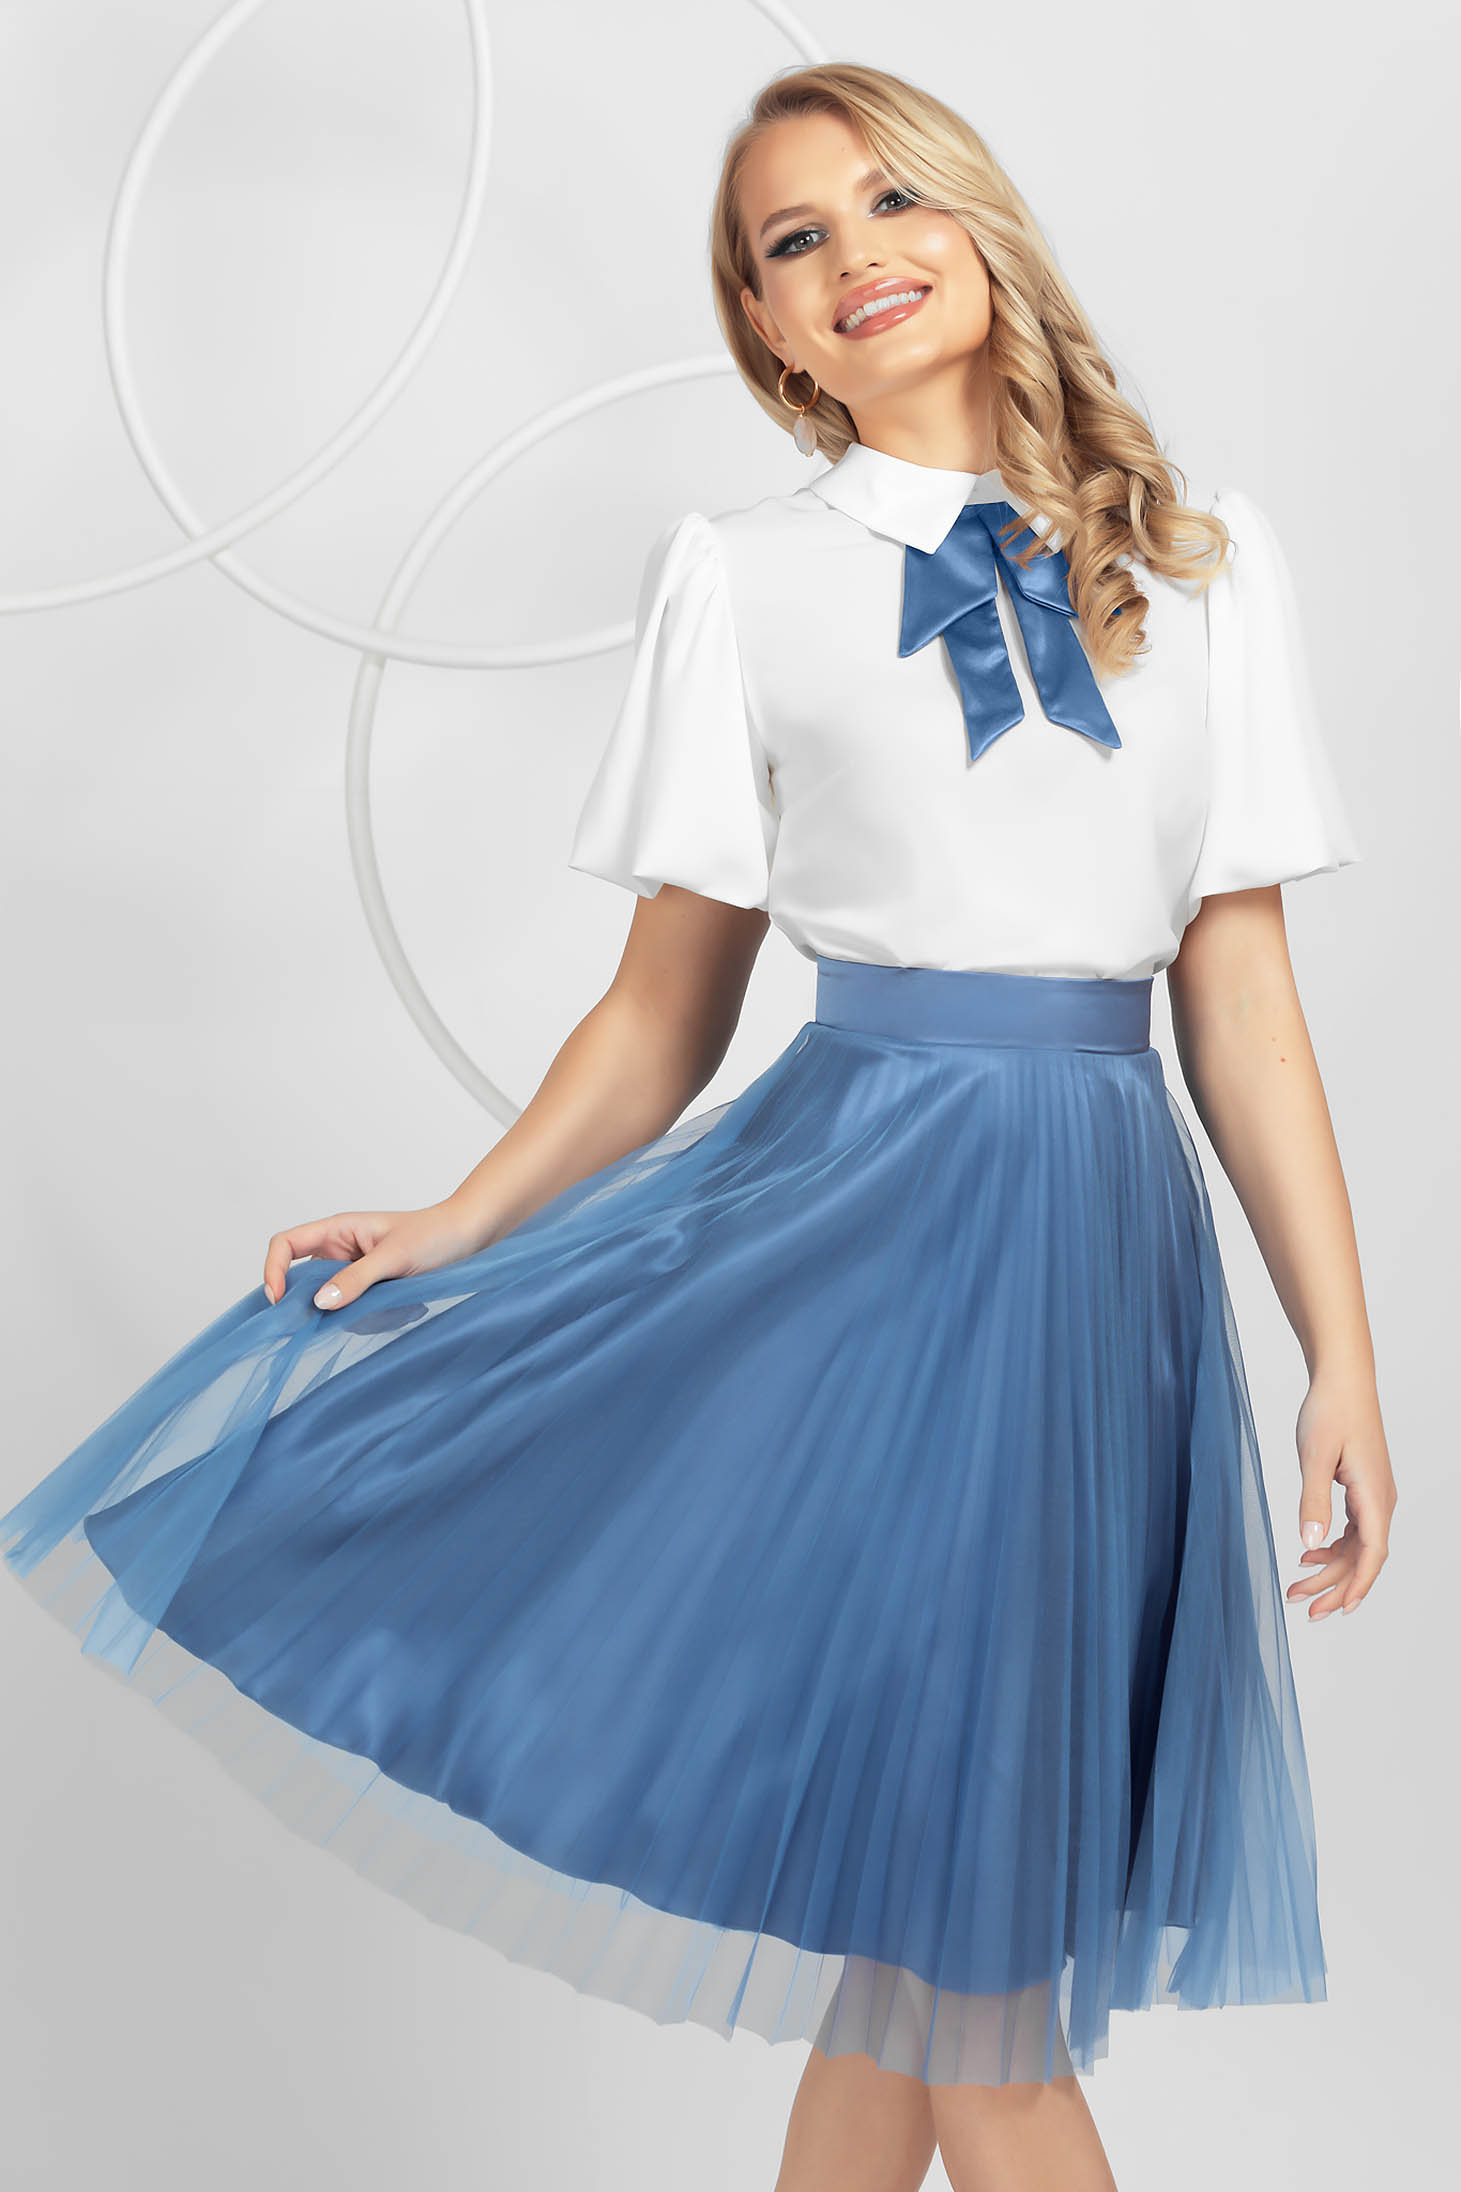 Blue skirt elegant midi cloche from tulle high waisted folded up